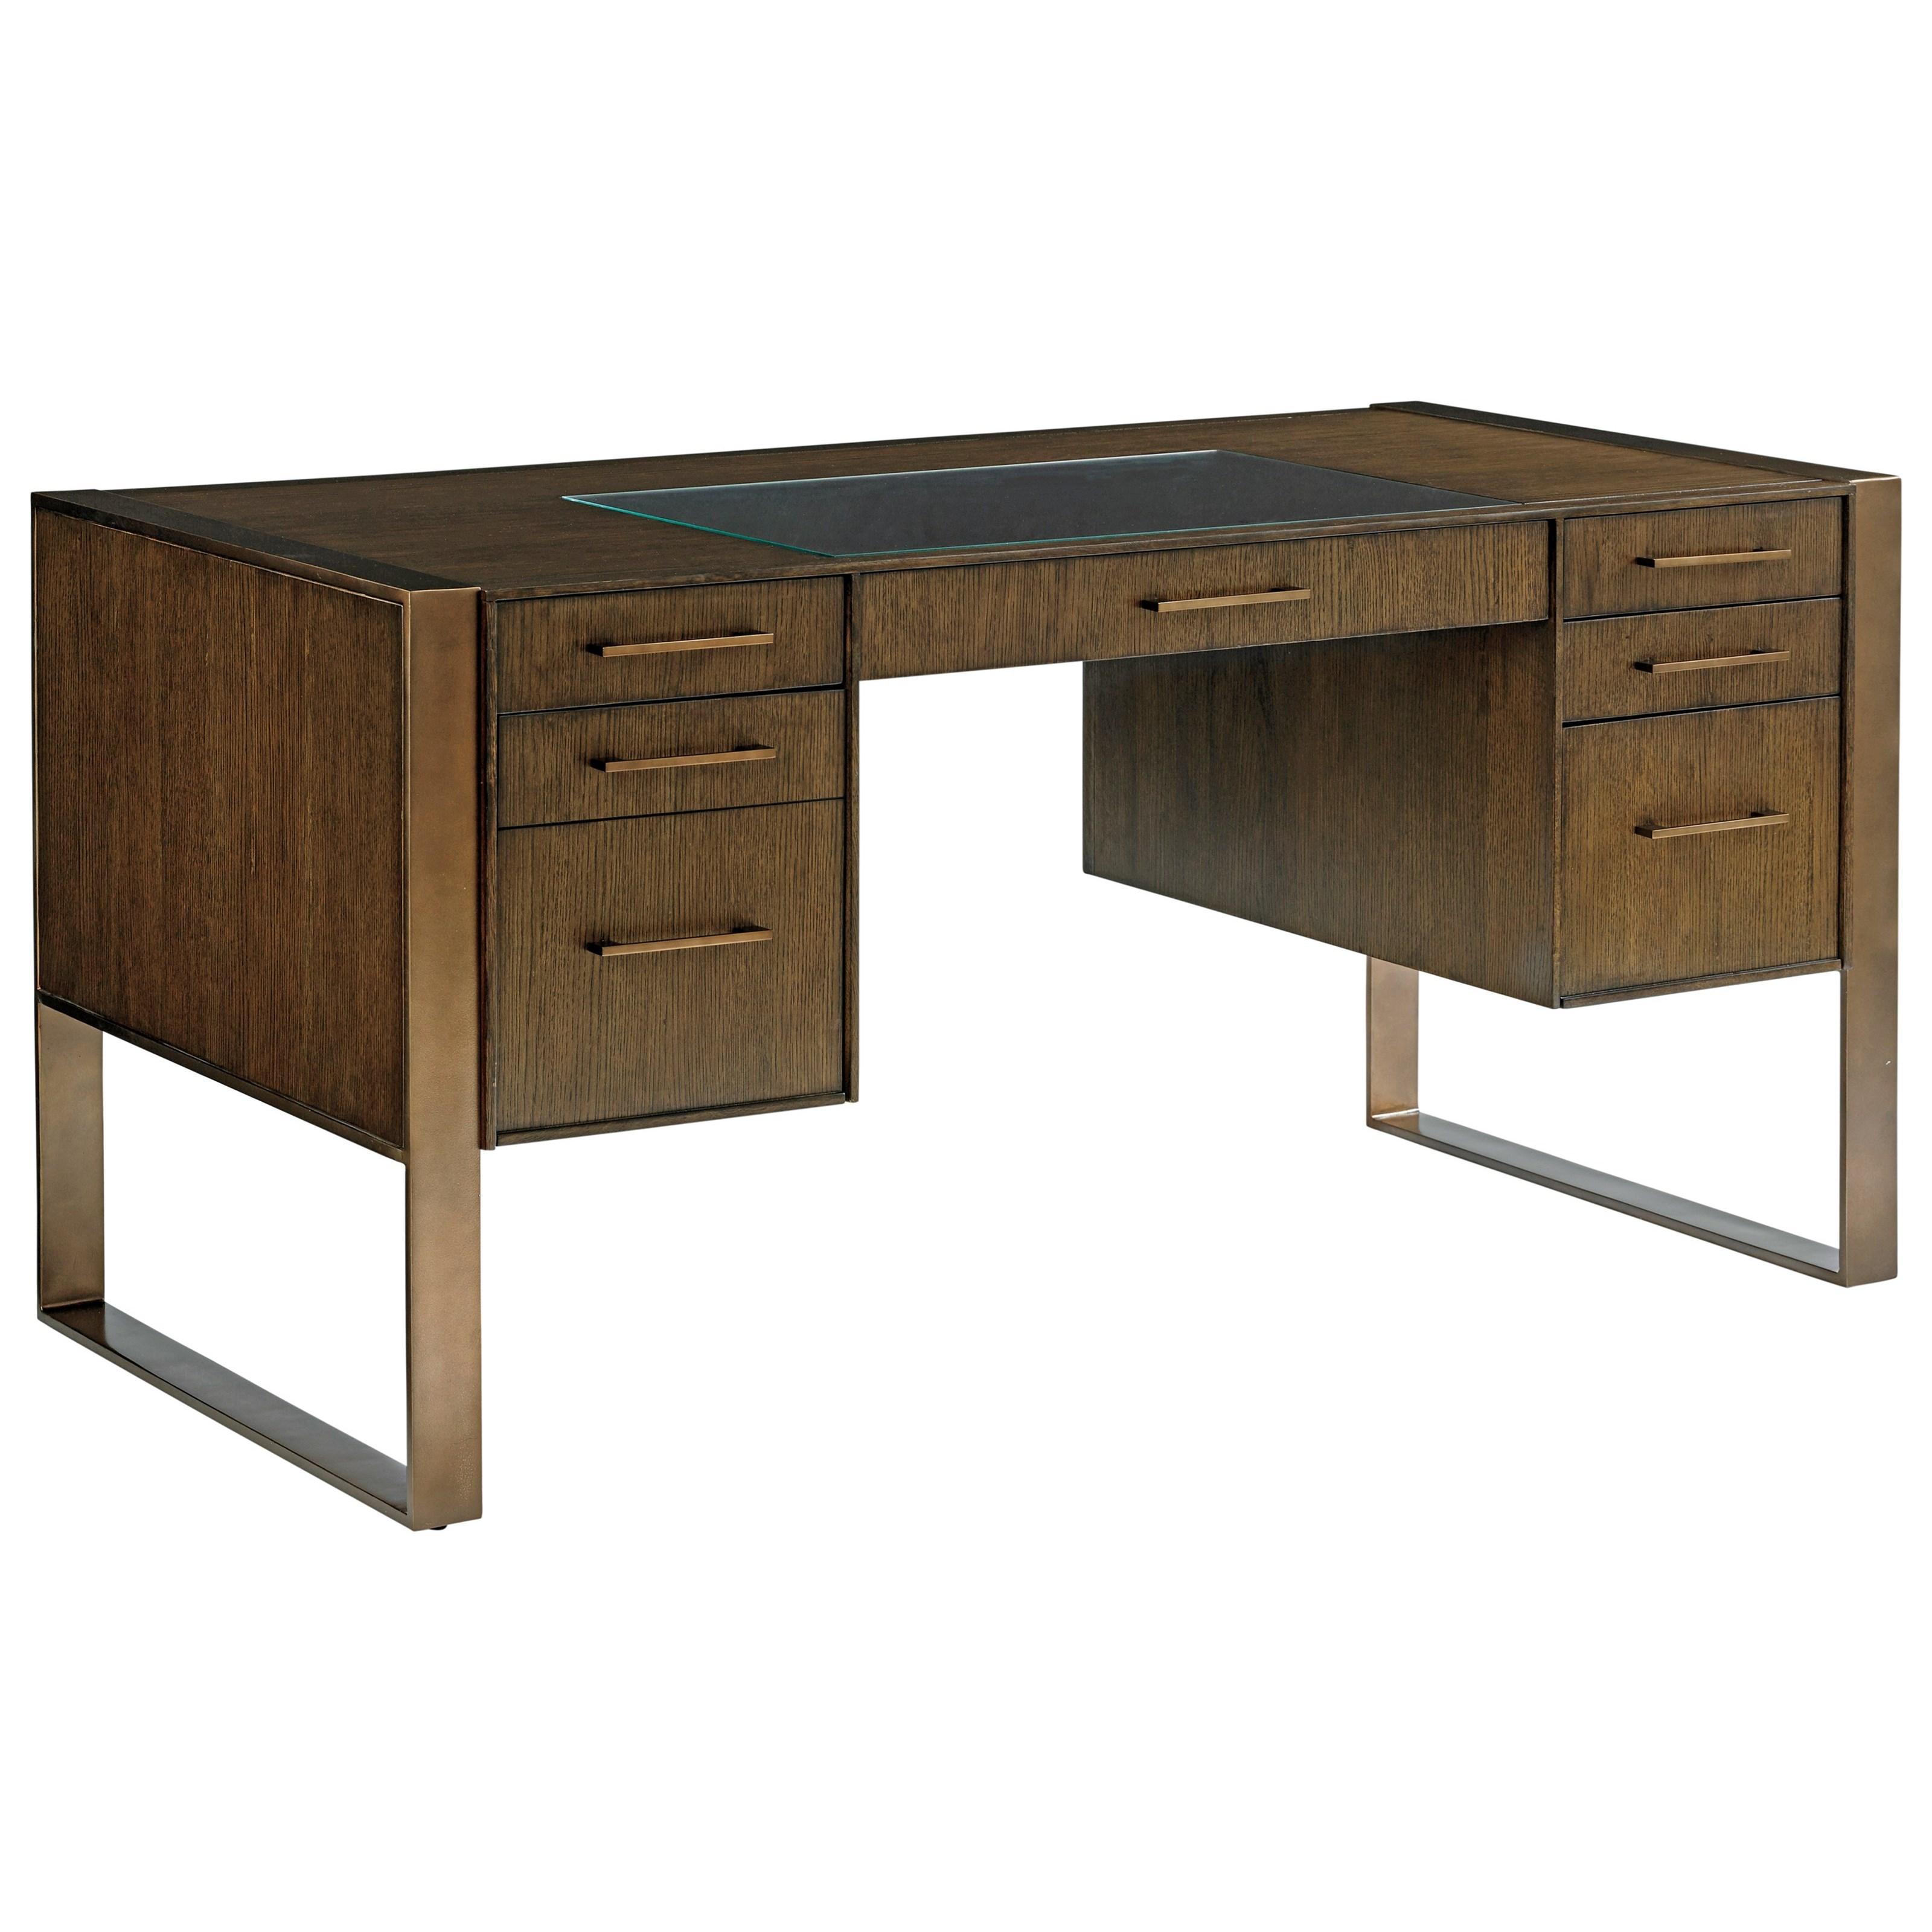 Cross Effect Modern Structure Desk by Sligh at Baer's Furniture